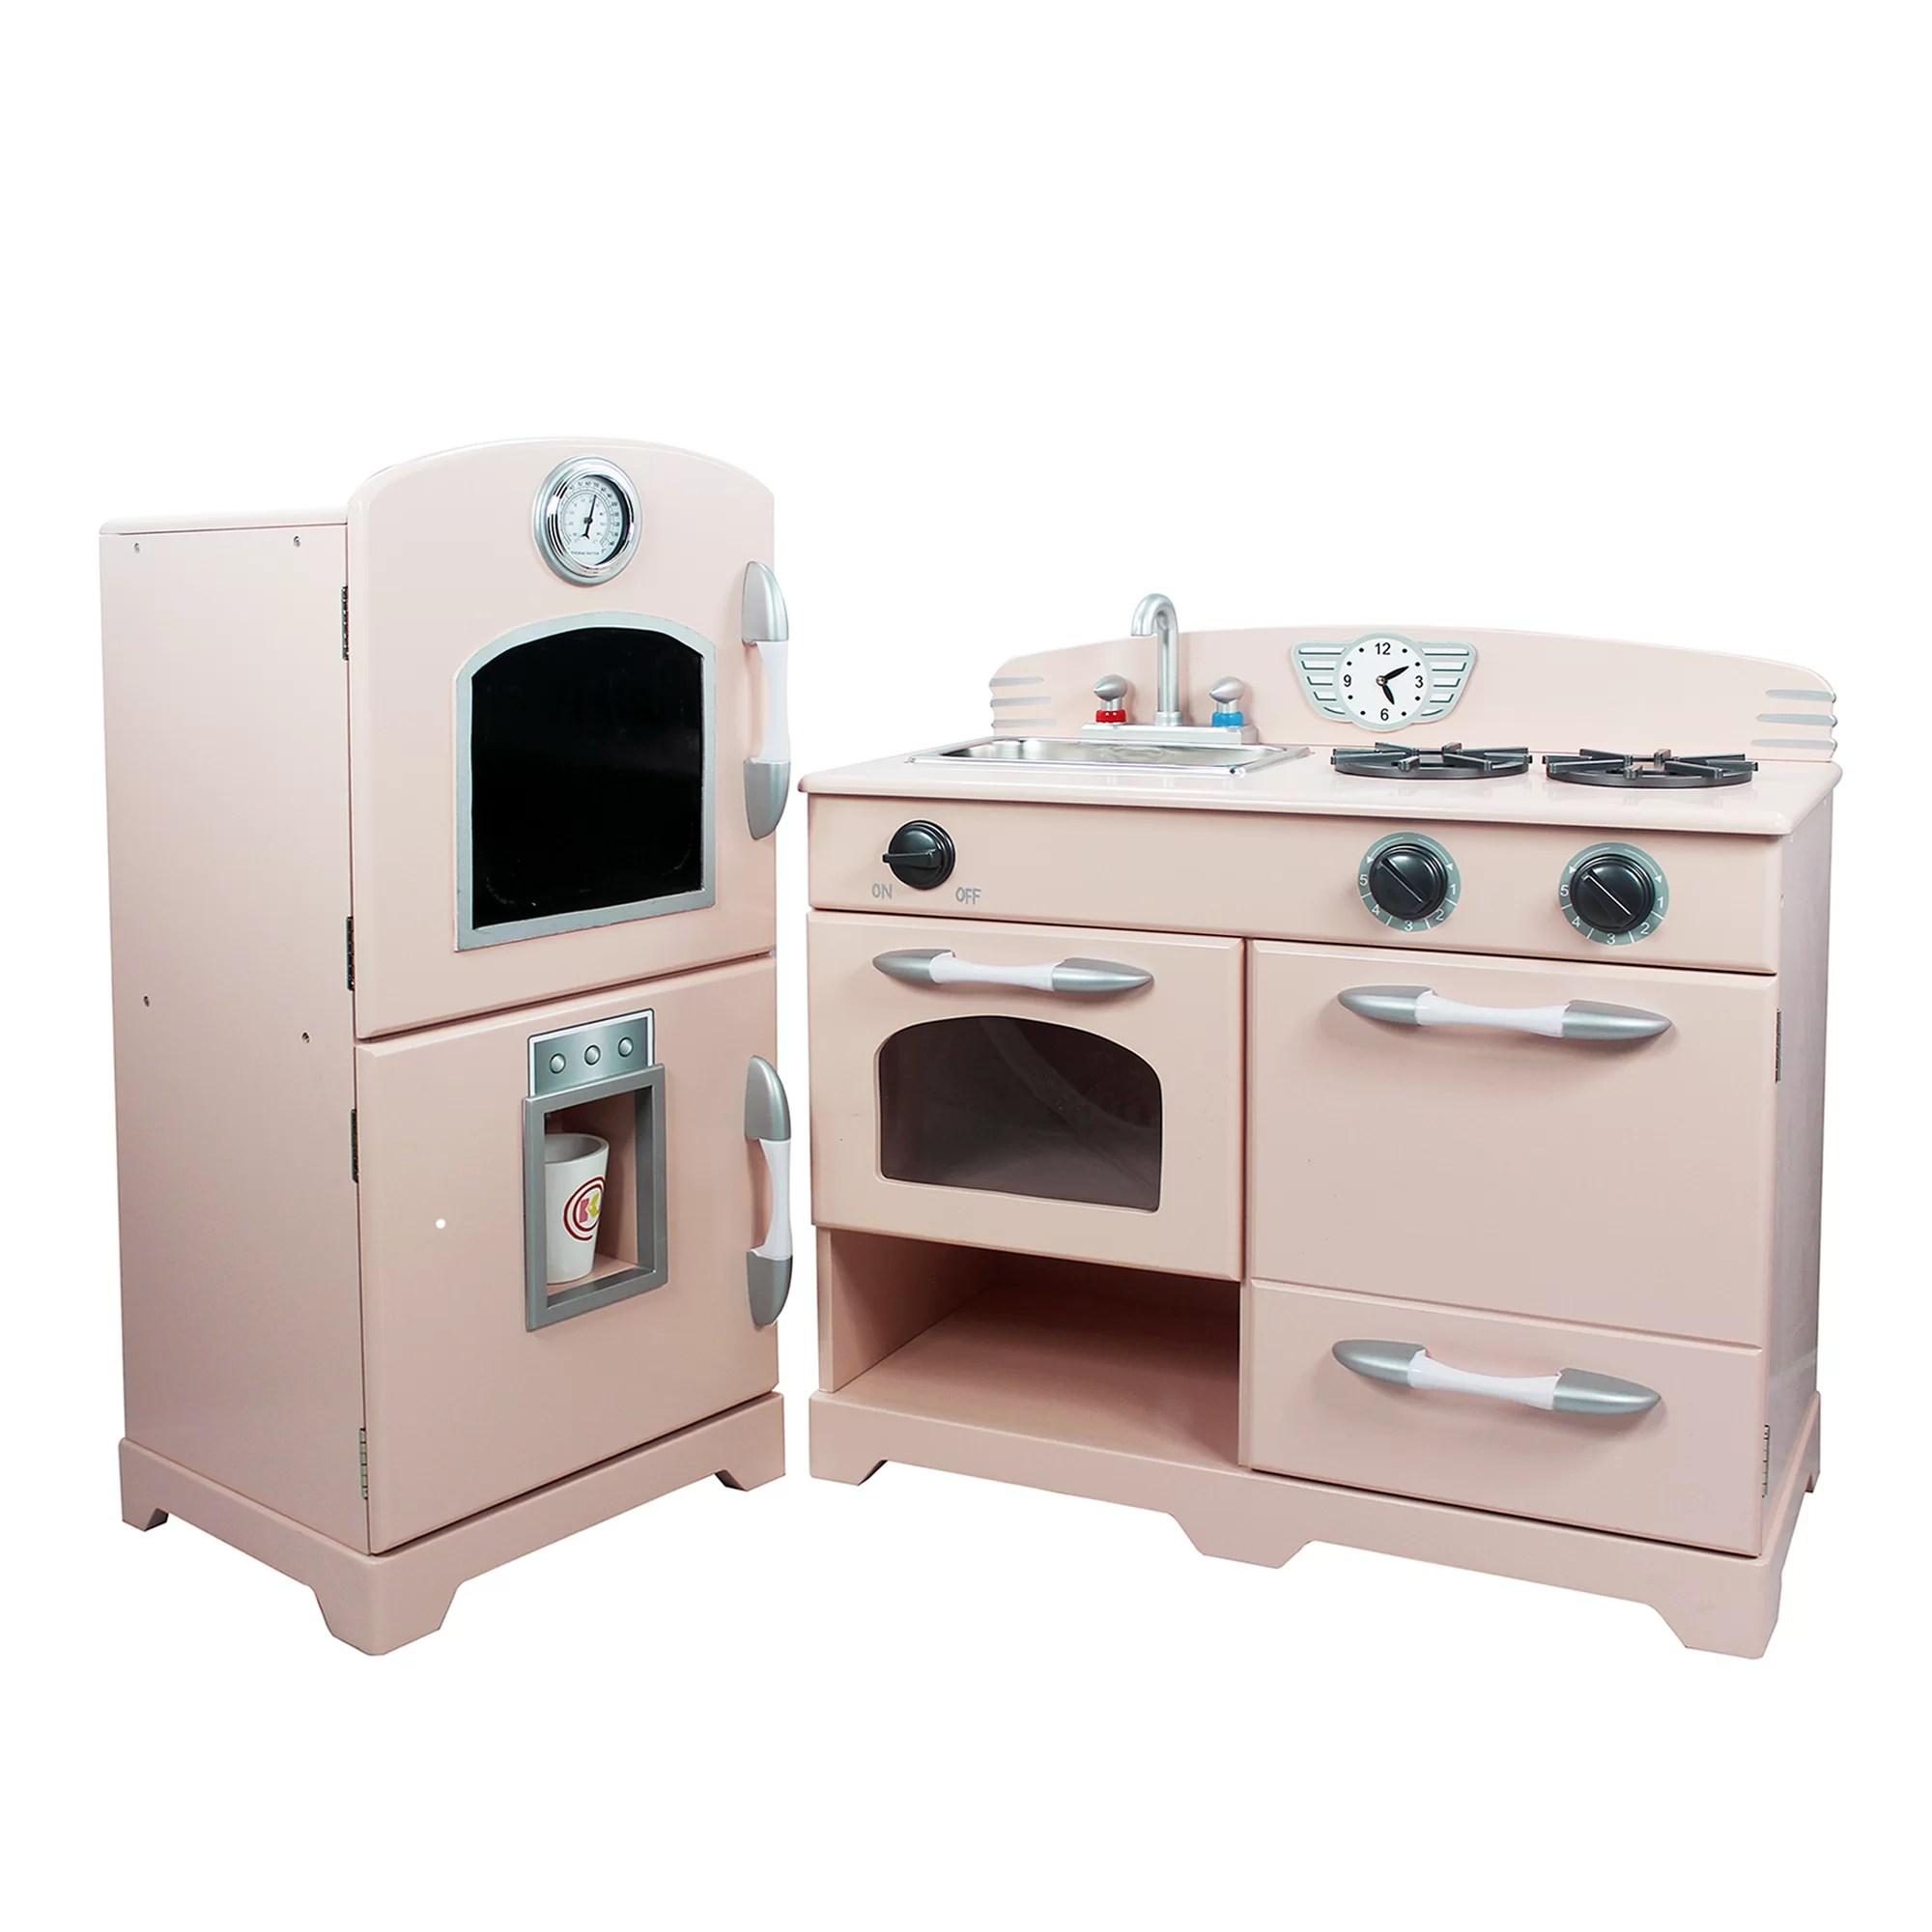 Teamson Kids 2 Piece Wooden Play Kitchen Set  Reviews  Wayfairca